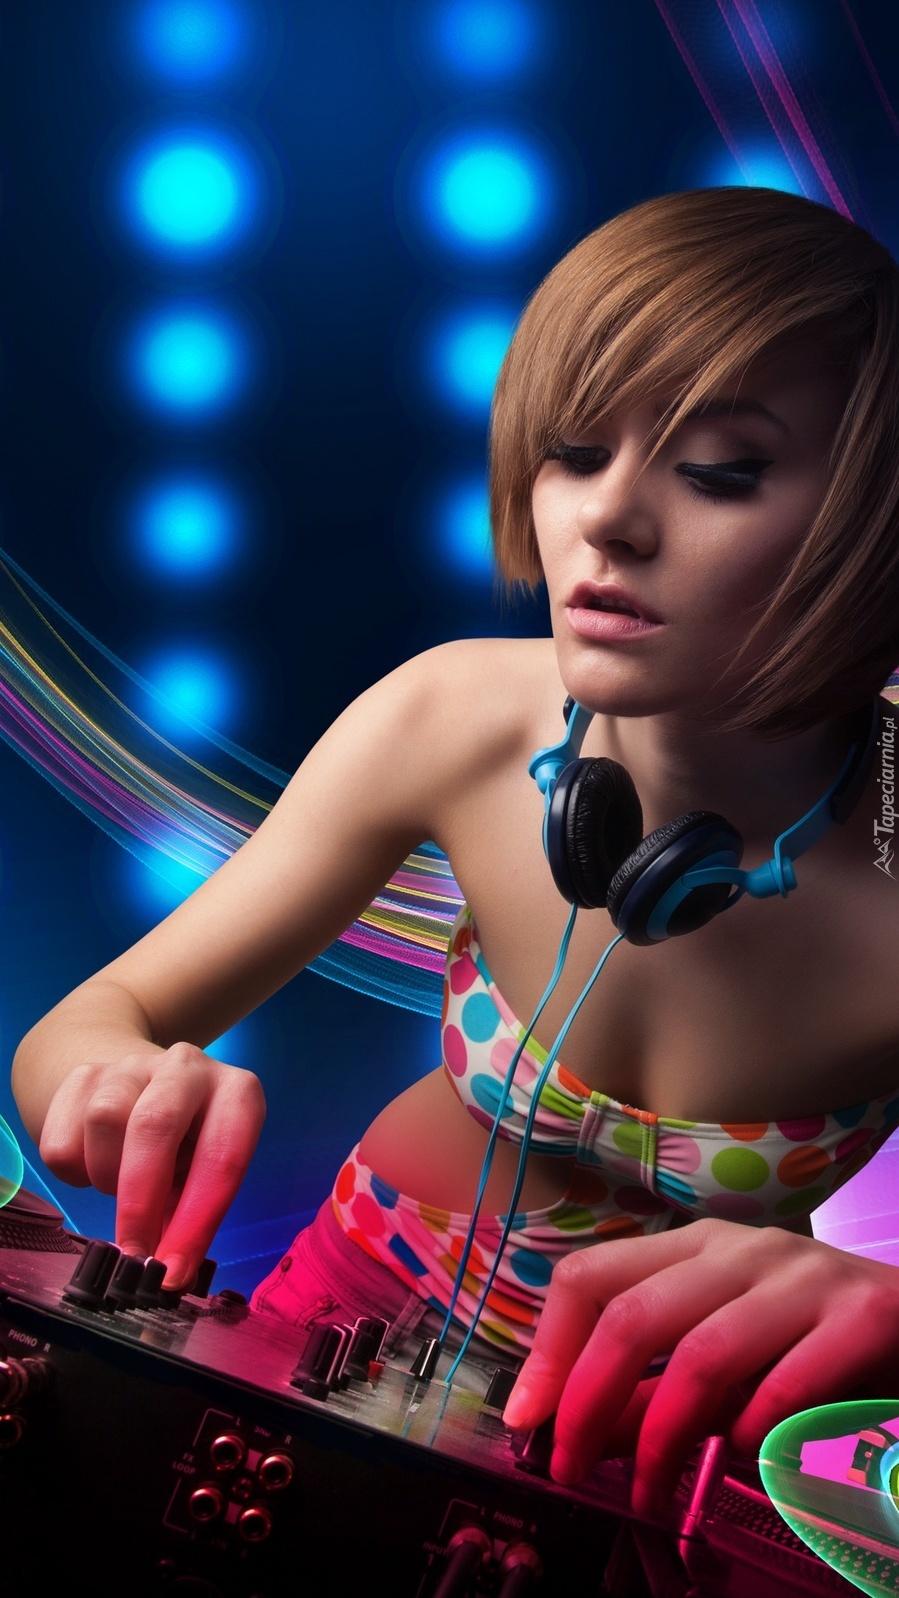 Niech muzyka gra